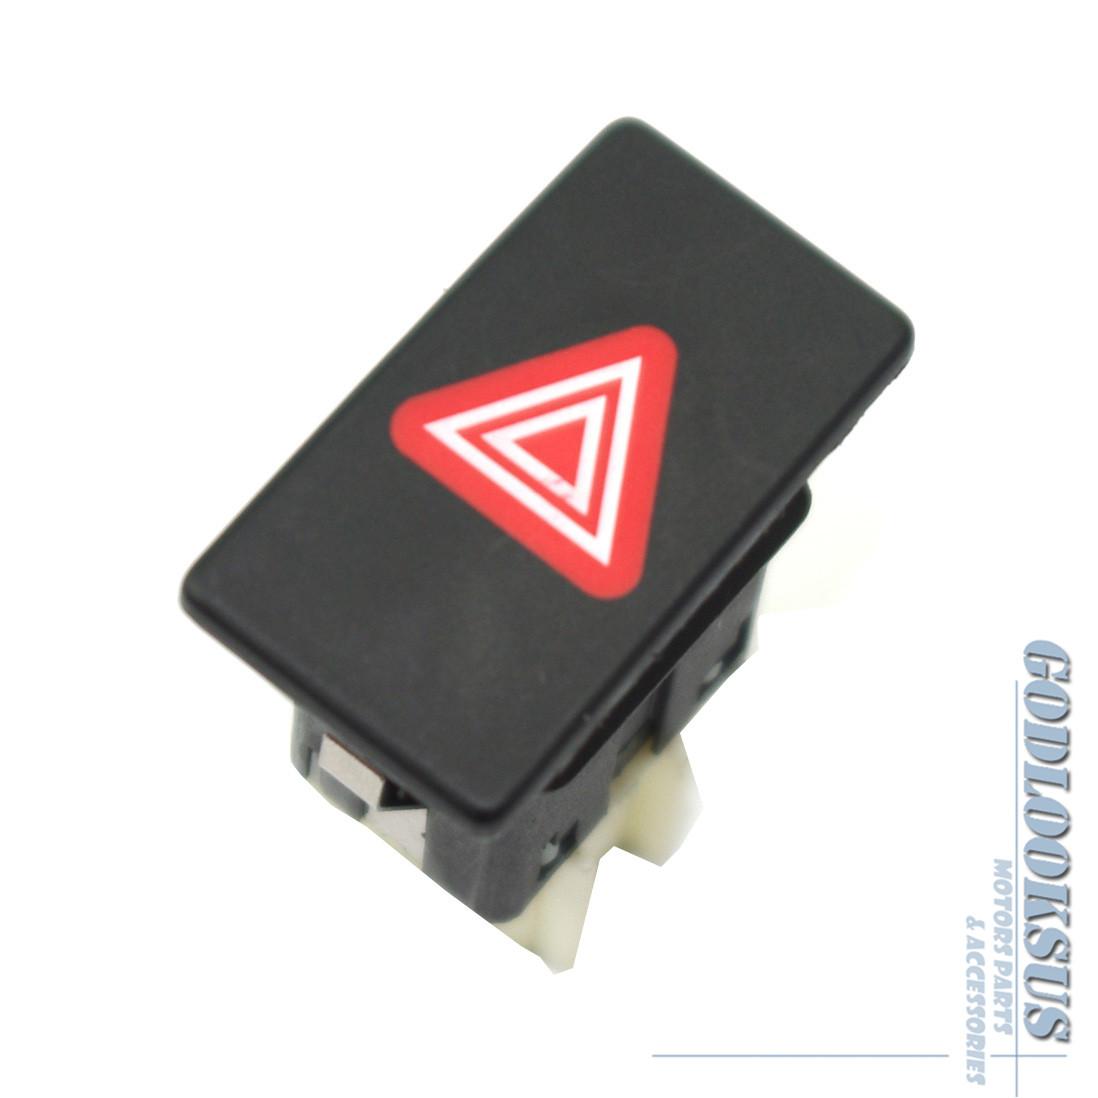 5C6 953 509 A Hazard Flashers Switch Control Button 11-14 VW Jetta MK6 Genuine